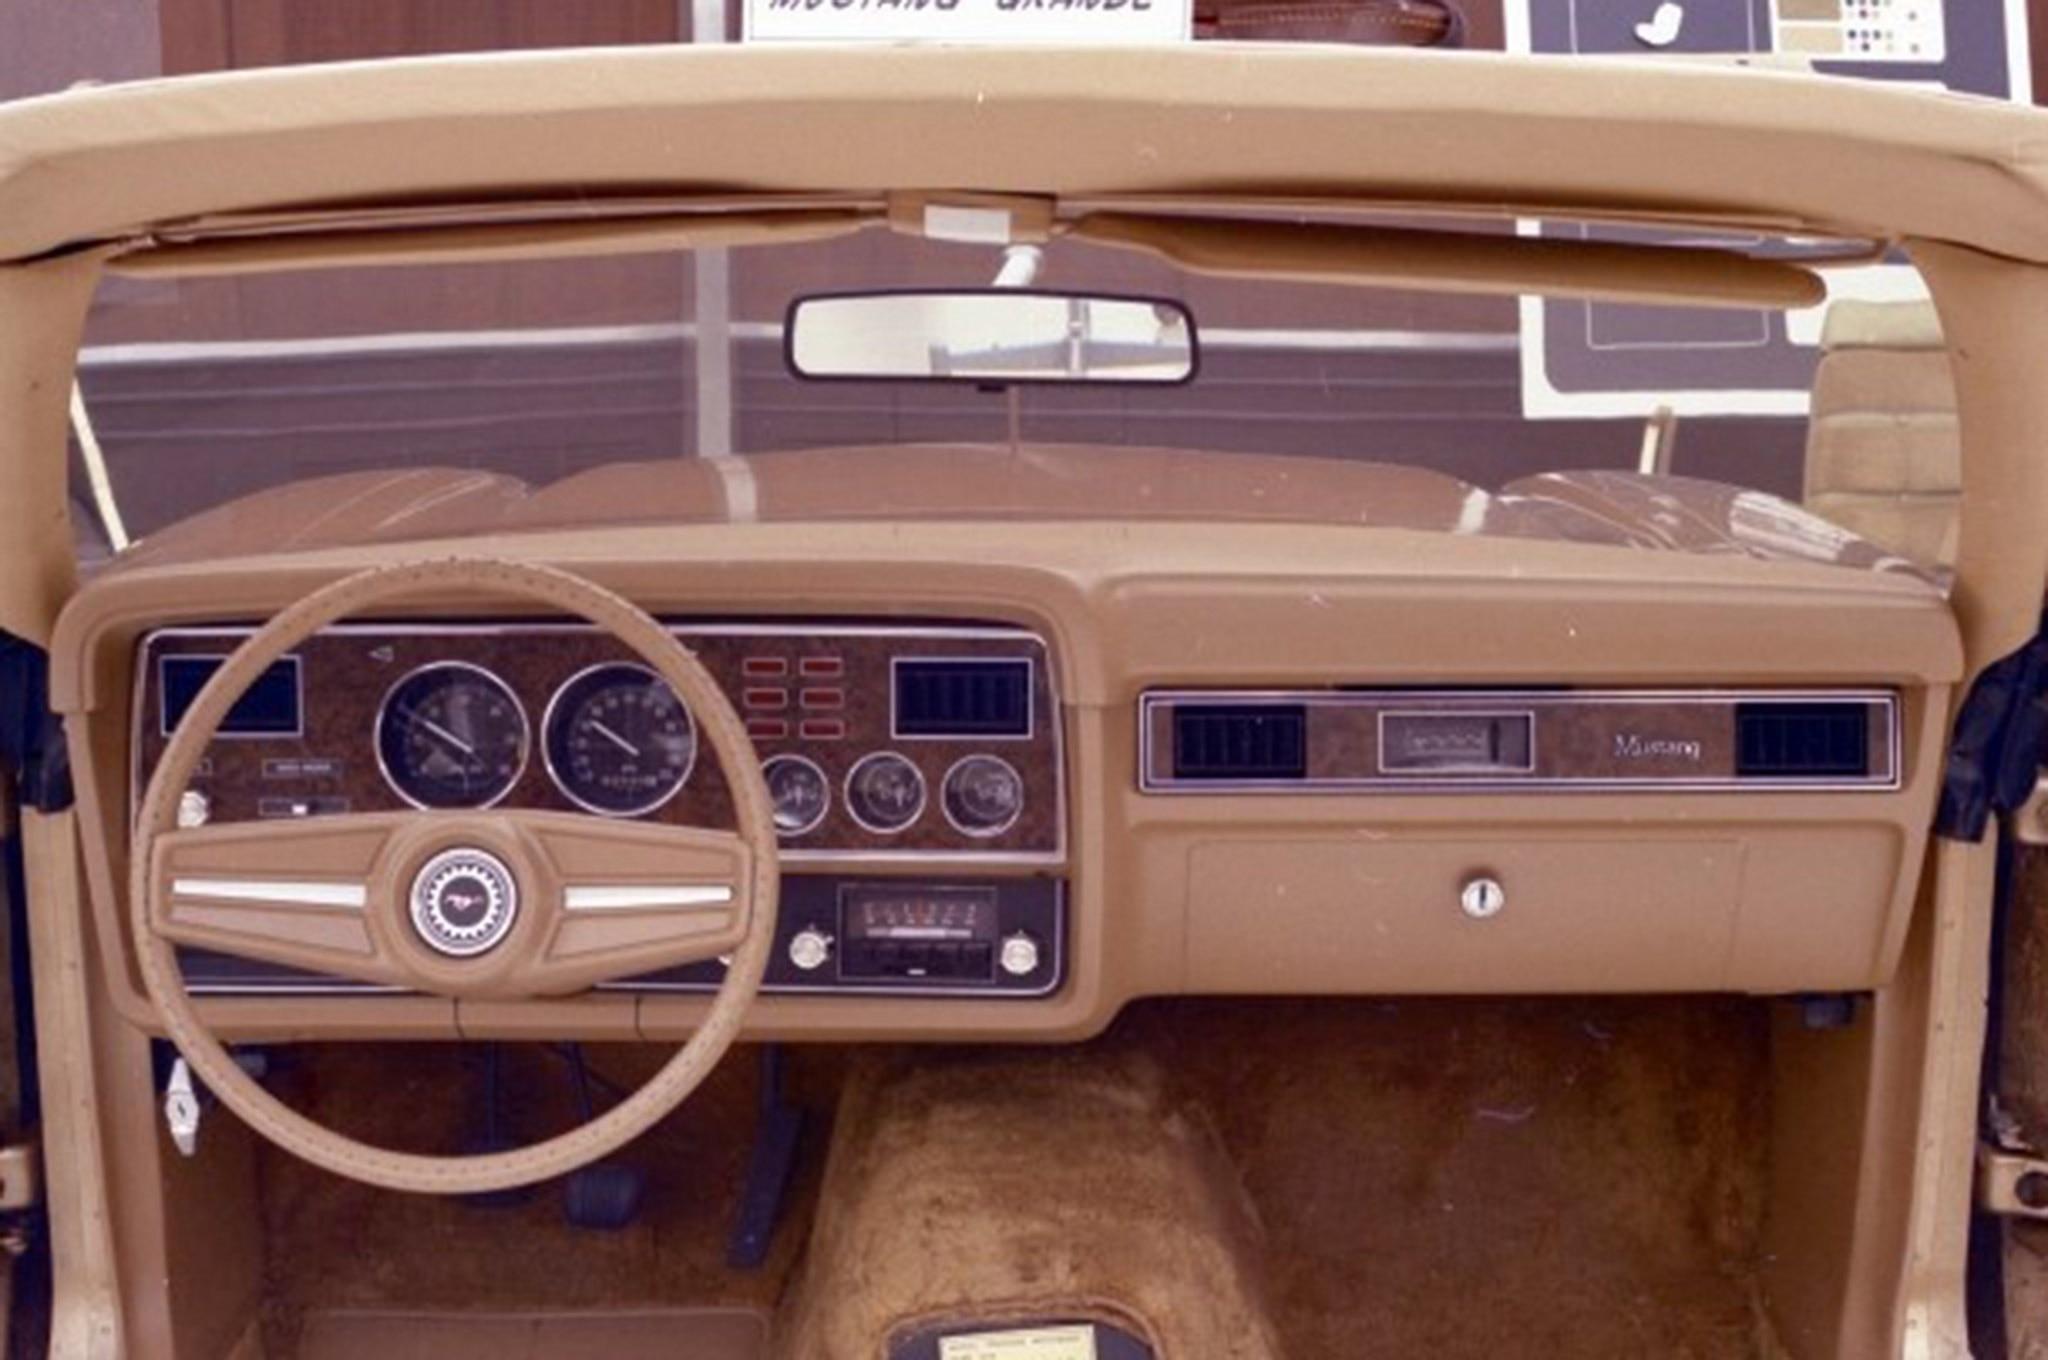 Ford Mustang Steering Wheel Evolution 1974